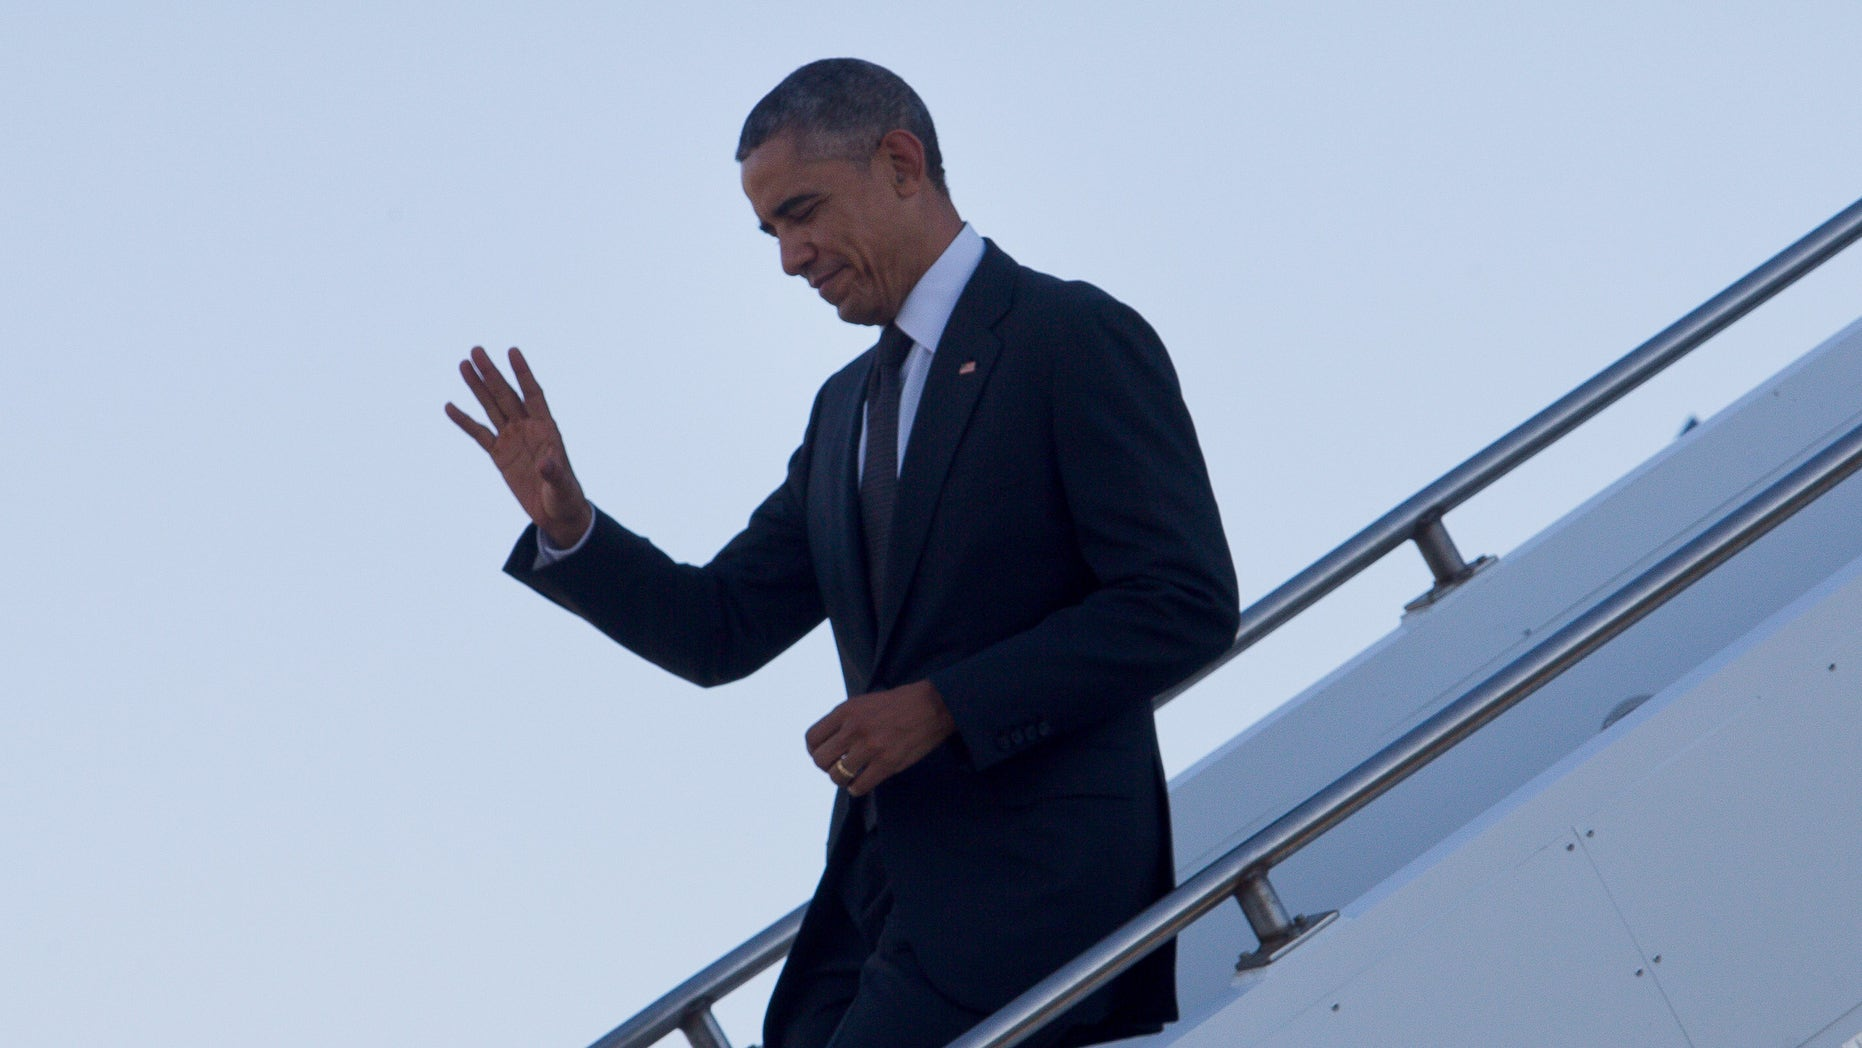 Nov. 15, 2014:  U.S. President Barack Obama waves as he arrives at Royal Australian Air Force Base Amberley near Brisbane, Australia